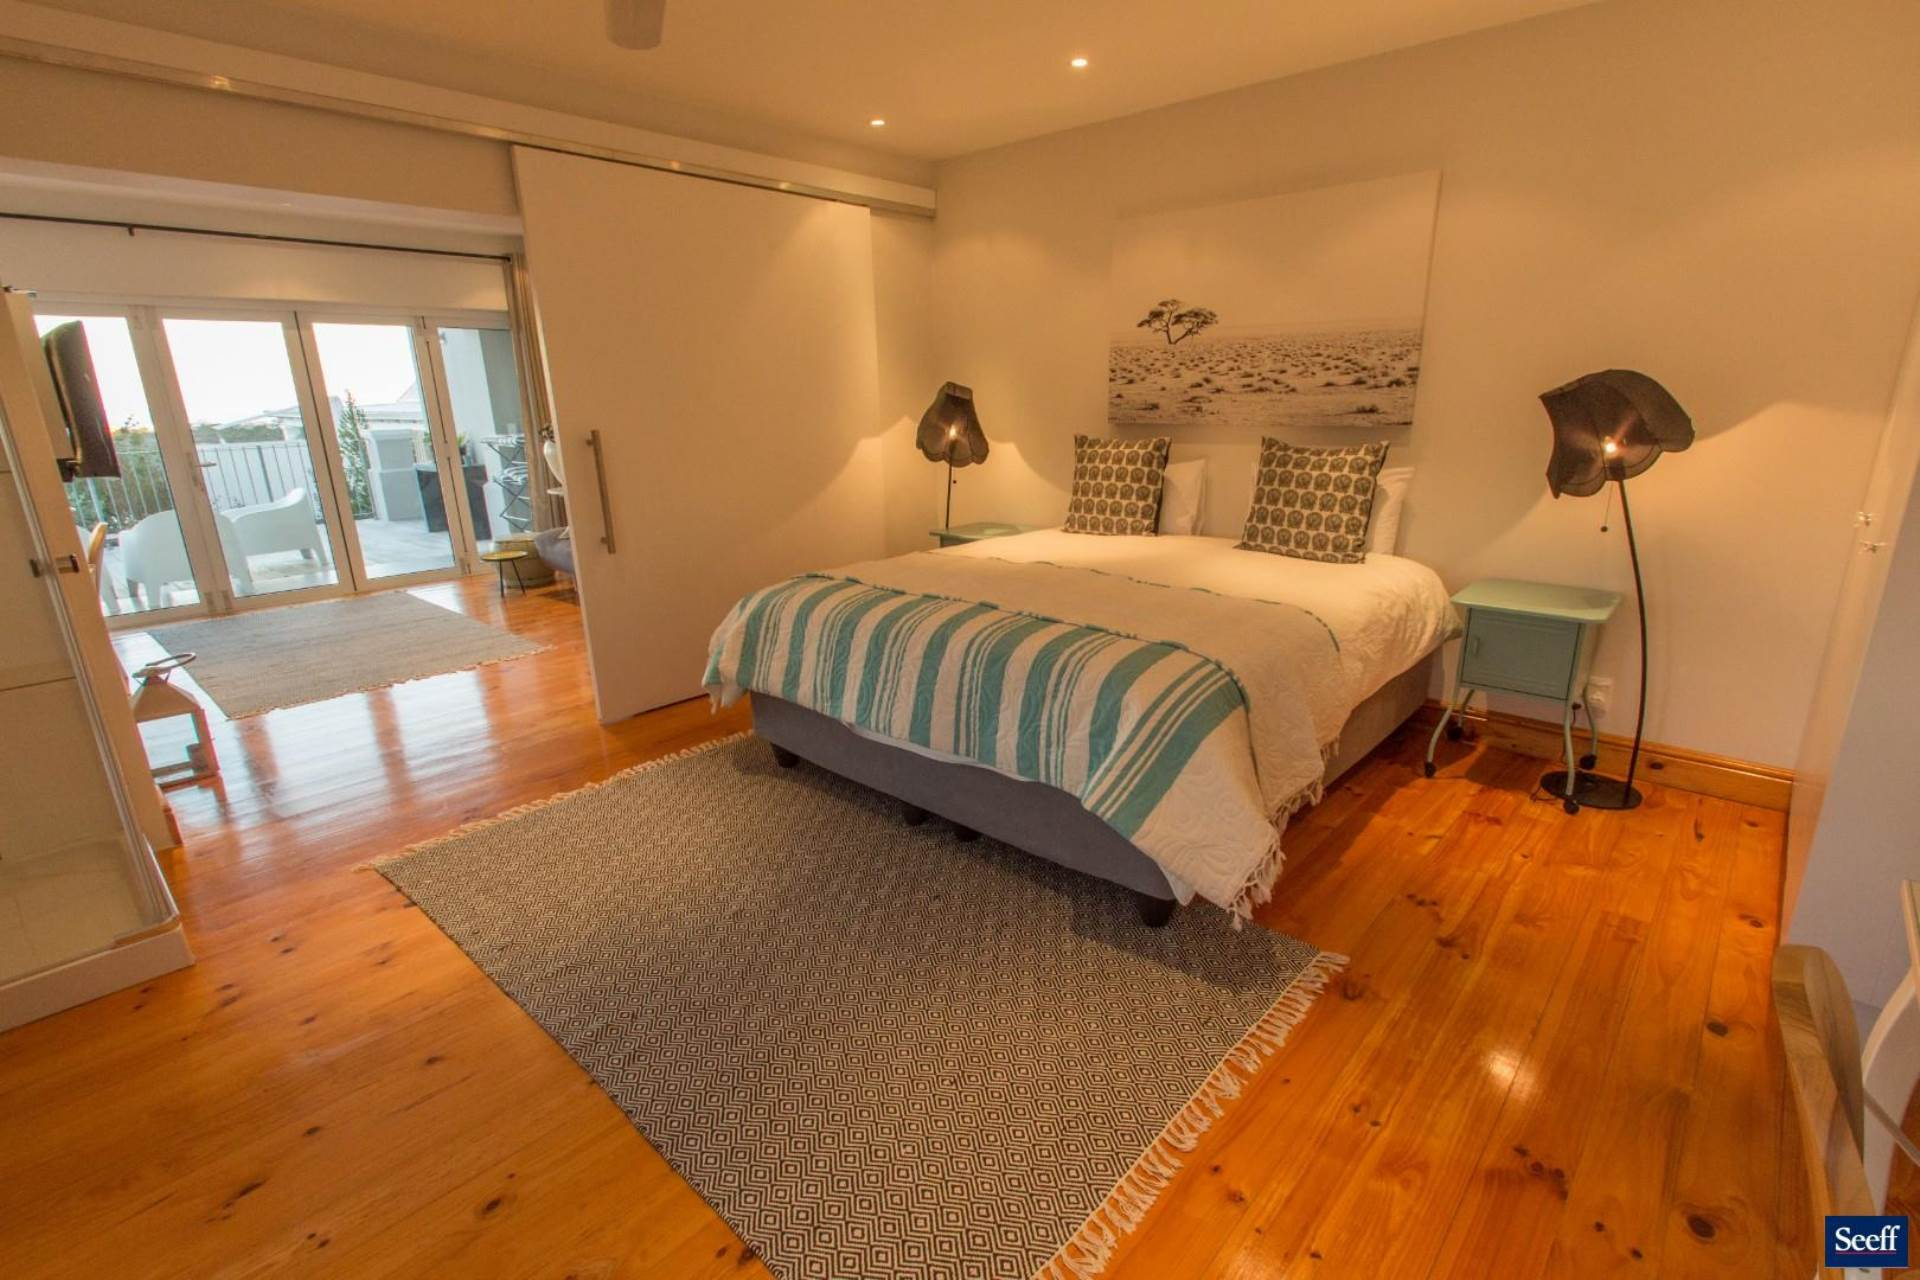 House for sale in schoongesicht plettenberg bay for r 9 for 7 bedroom house for sale